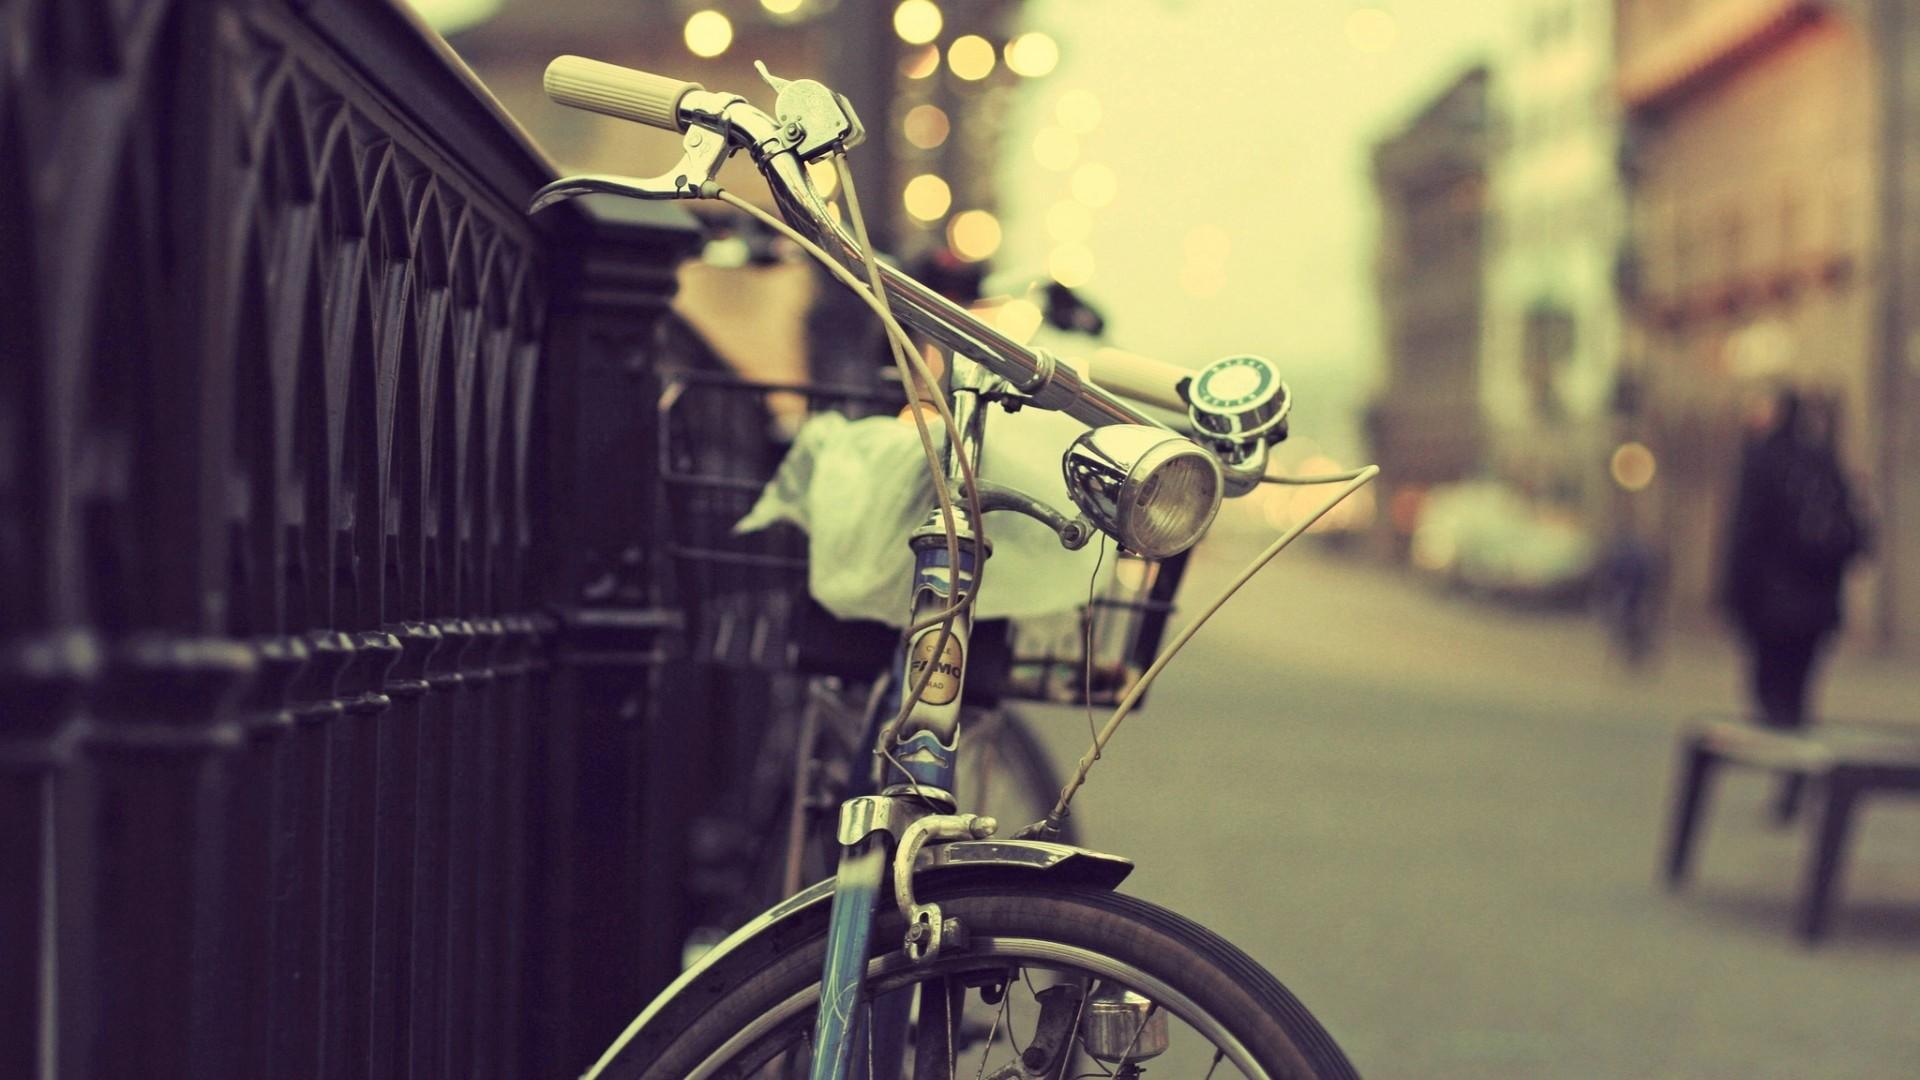 Vintage Road Bike Wallpaper